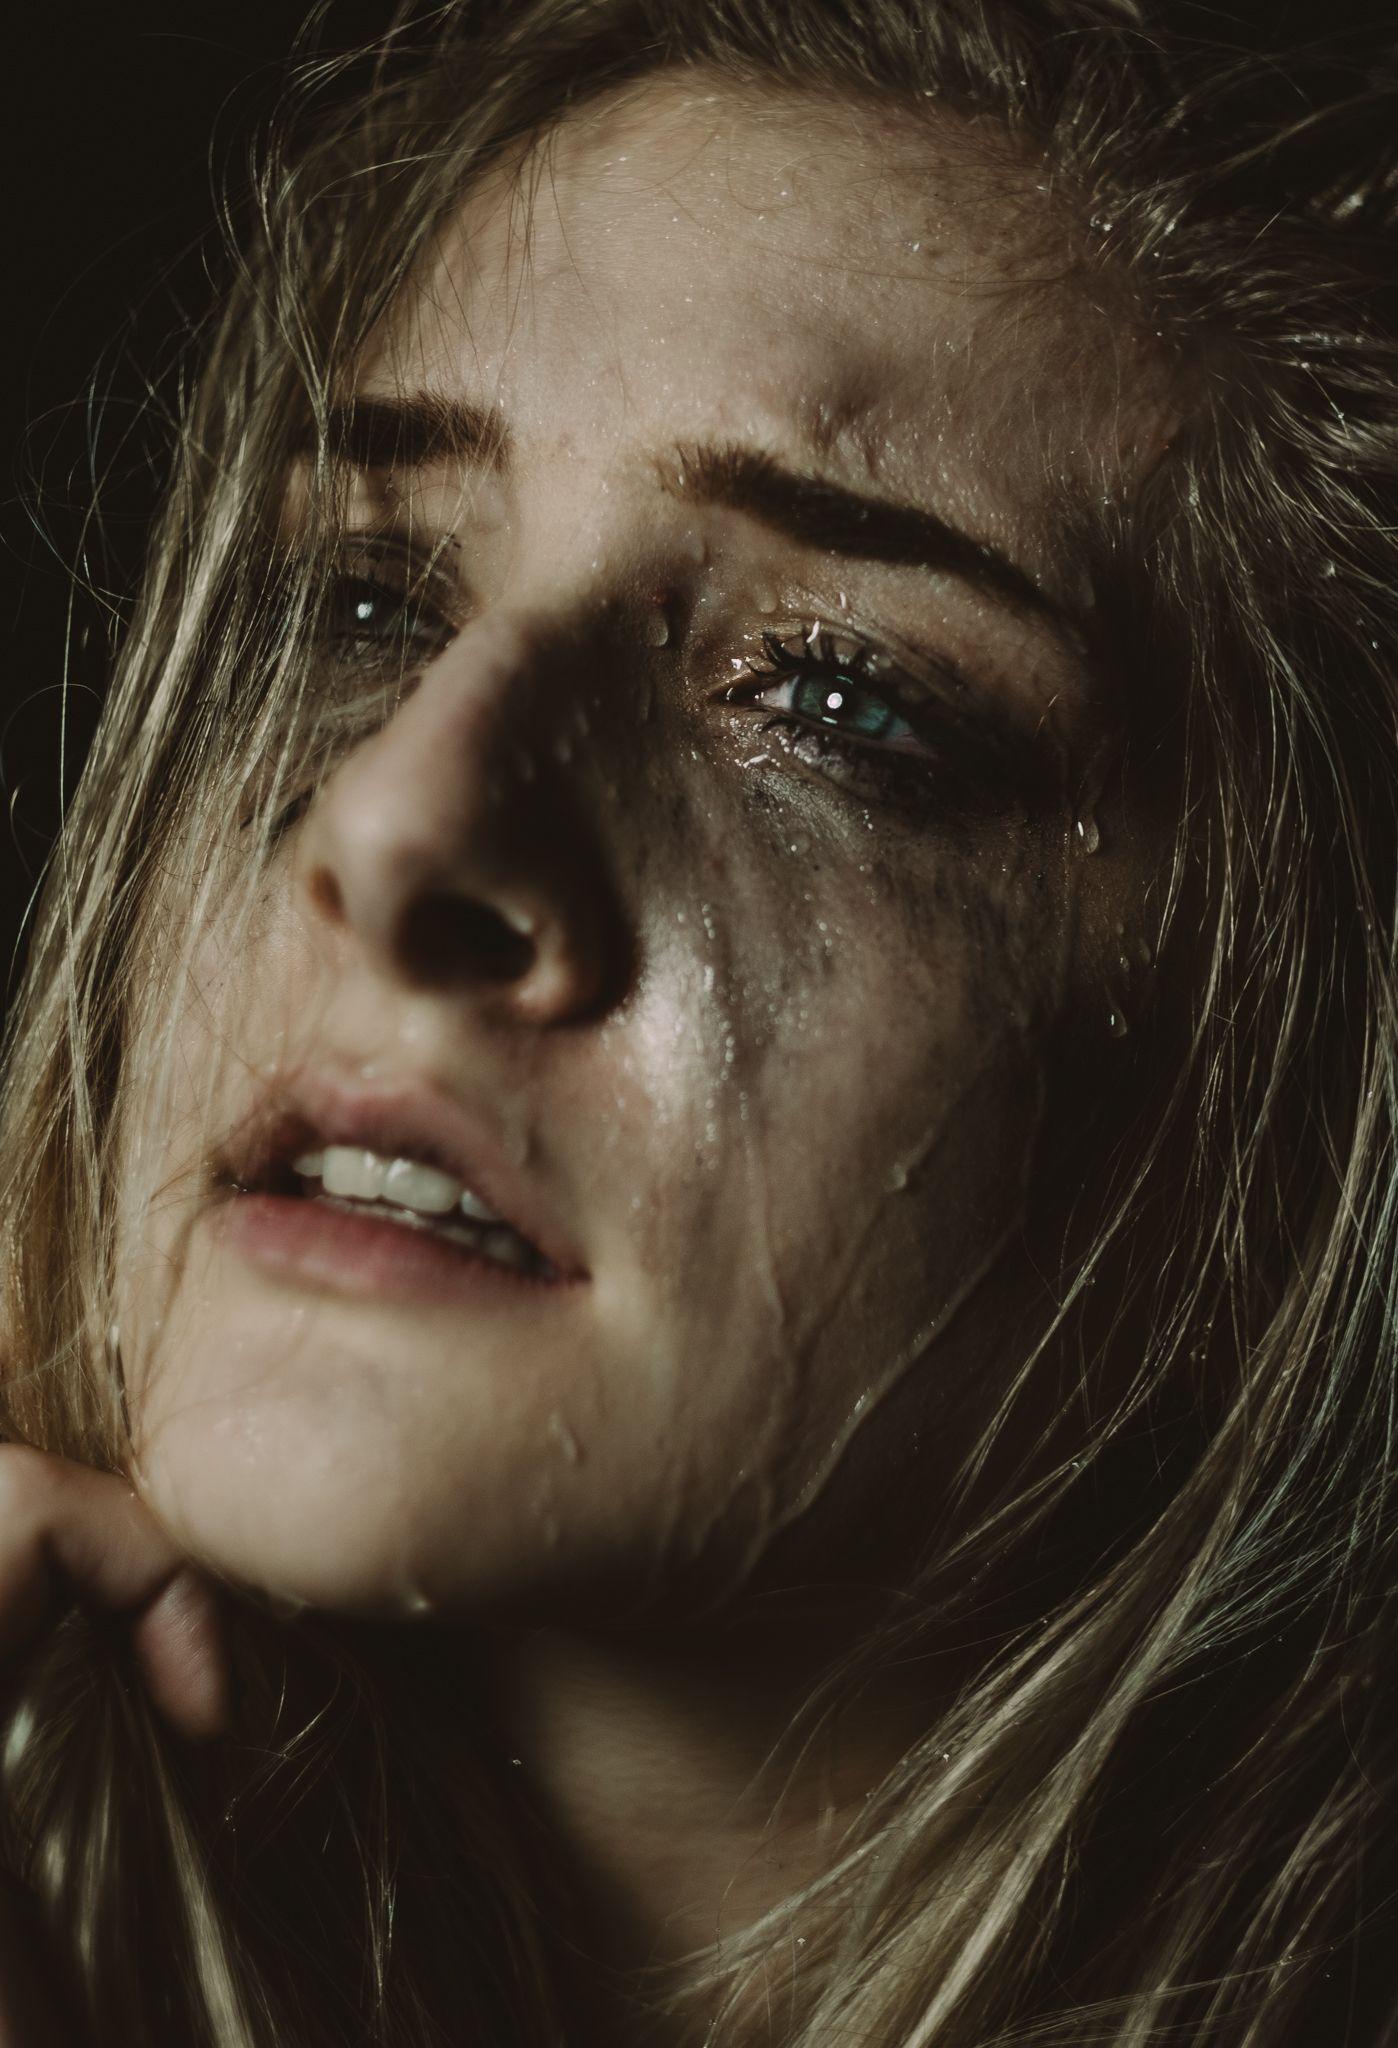 sadness + frustration Senior, girl, portrait, dark, LXC ...